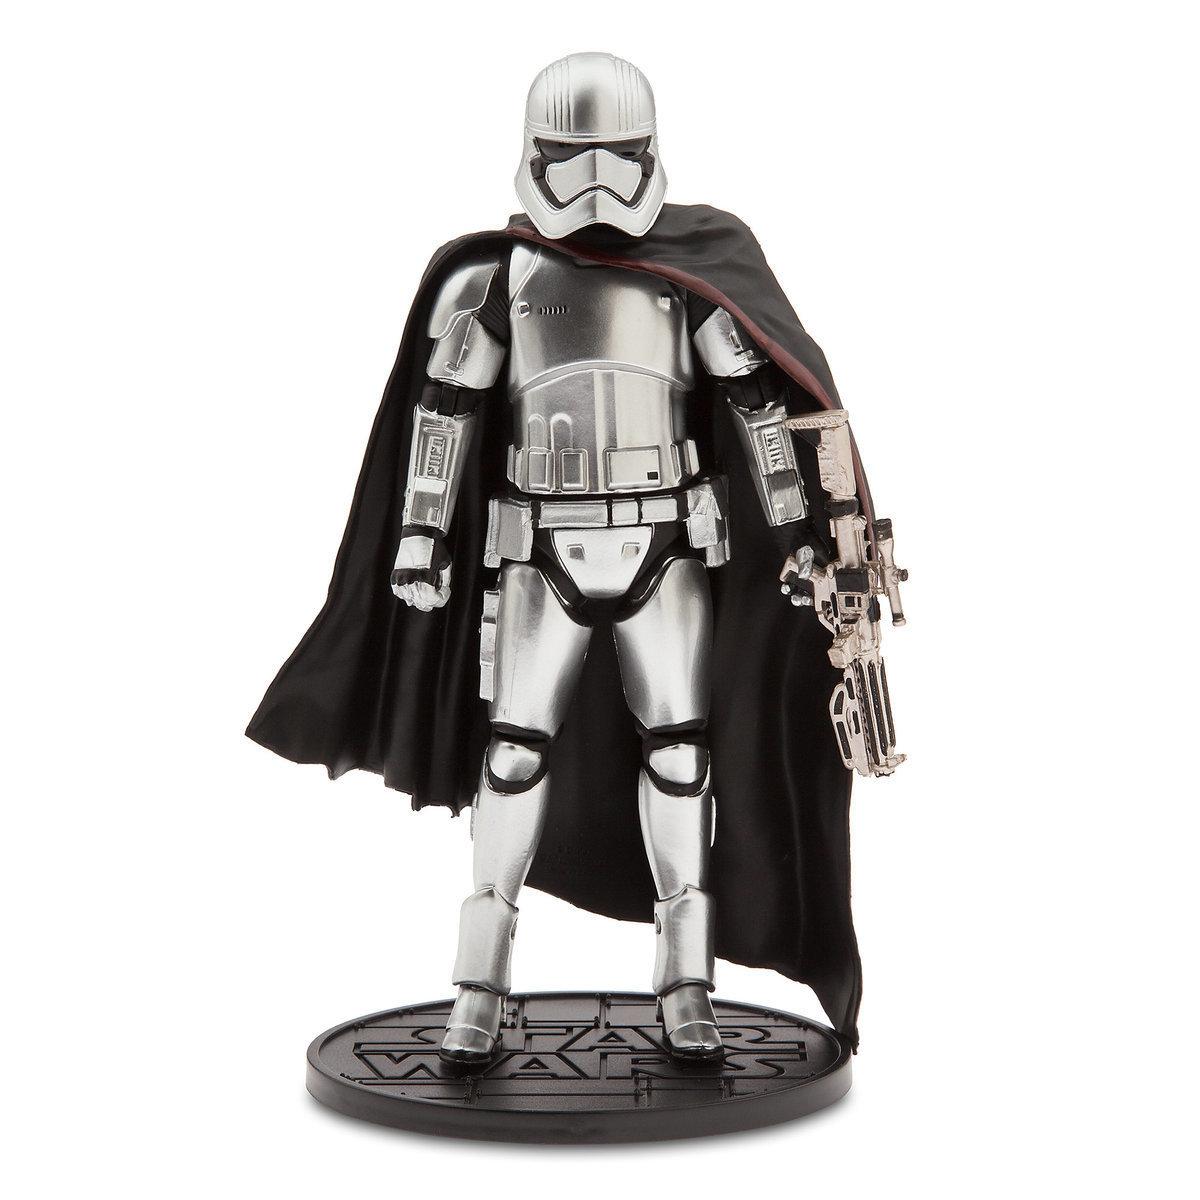 Фигурка Капитана Фазма - Star Wars Elite Series